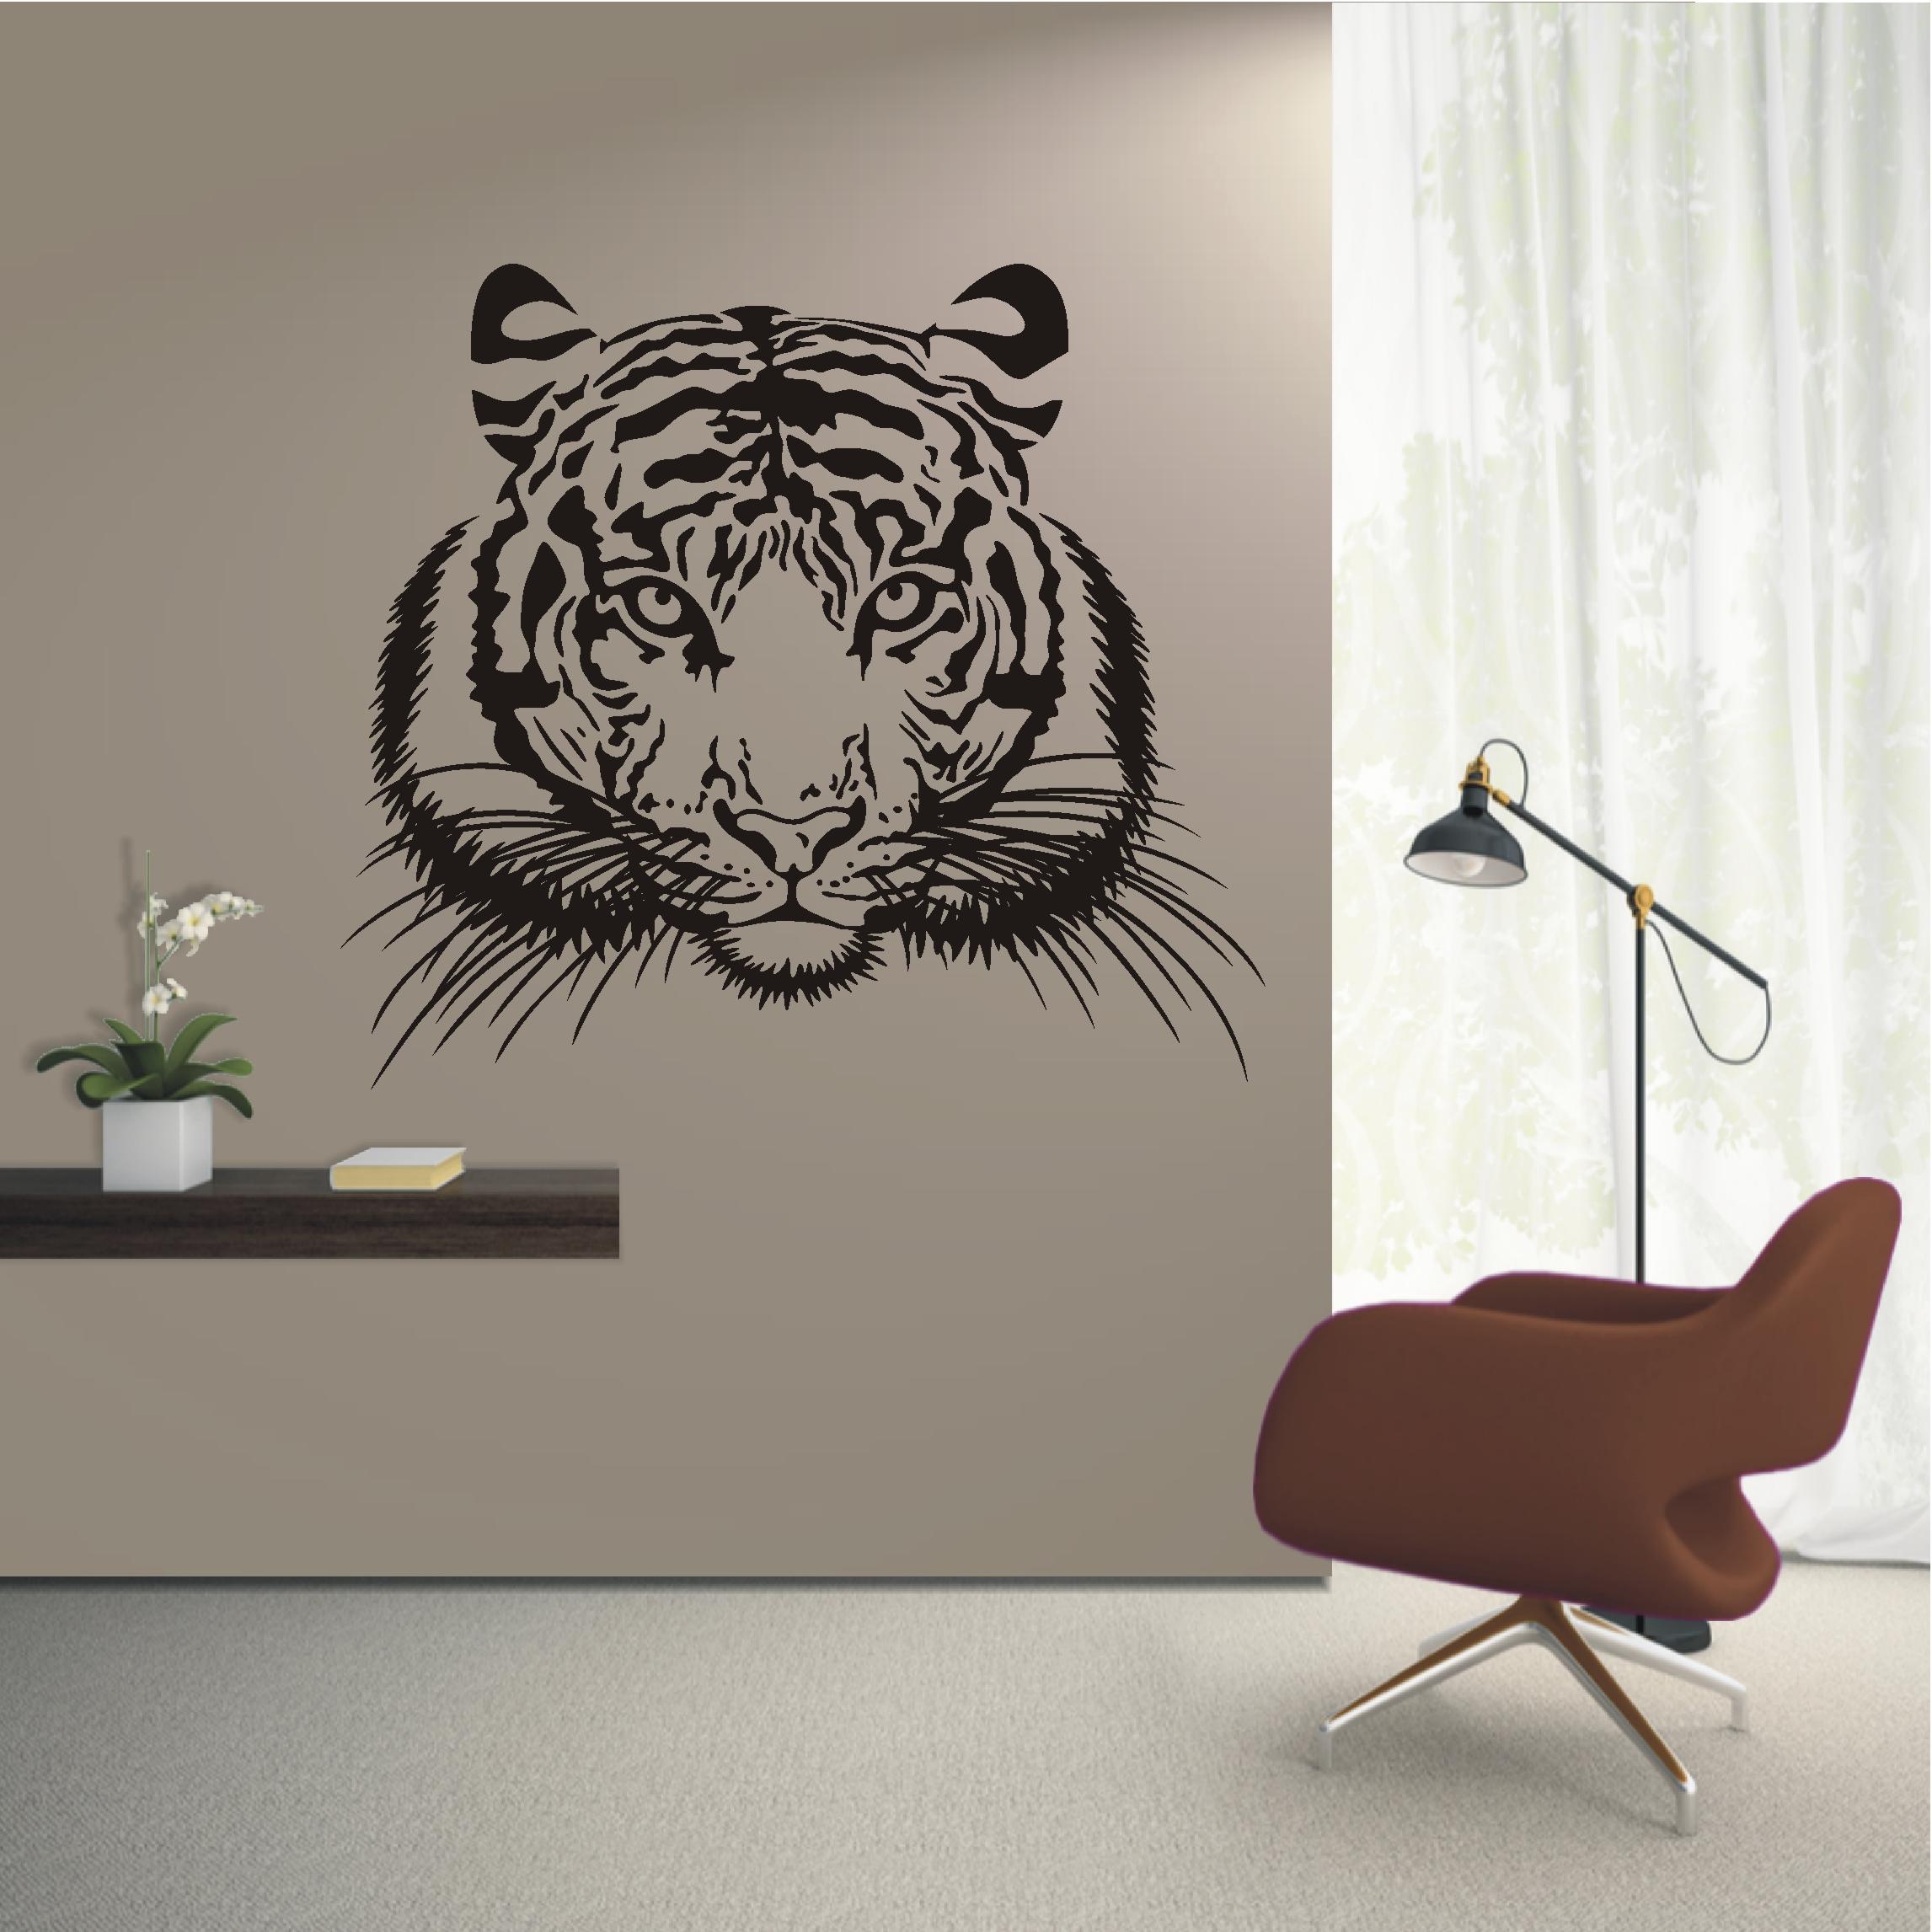 Deko shop wandtattoo tigerkopf deko shop for Wandtattoo kinderzimmer tiere